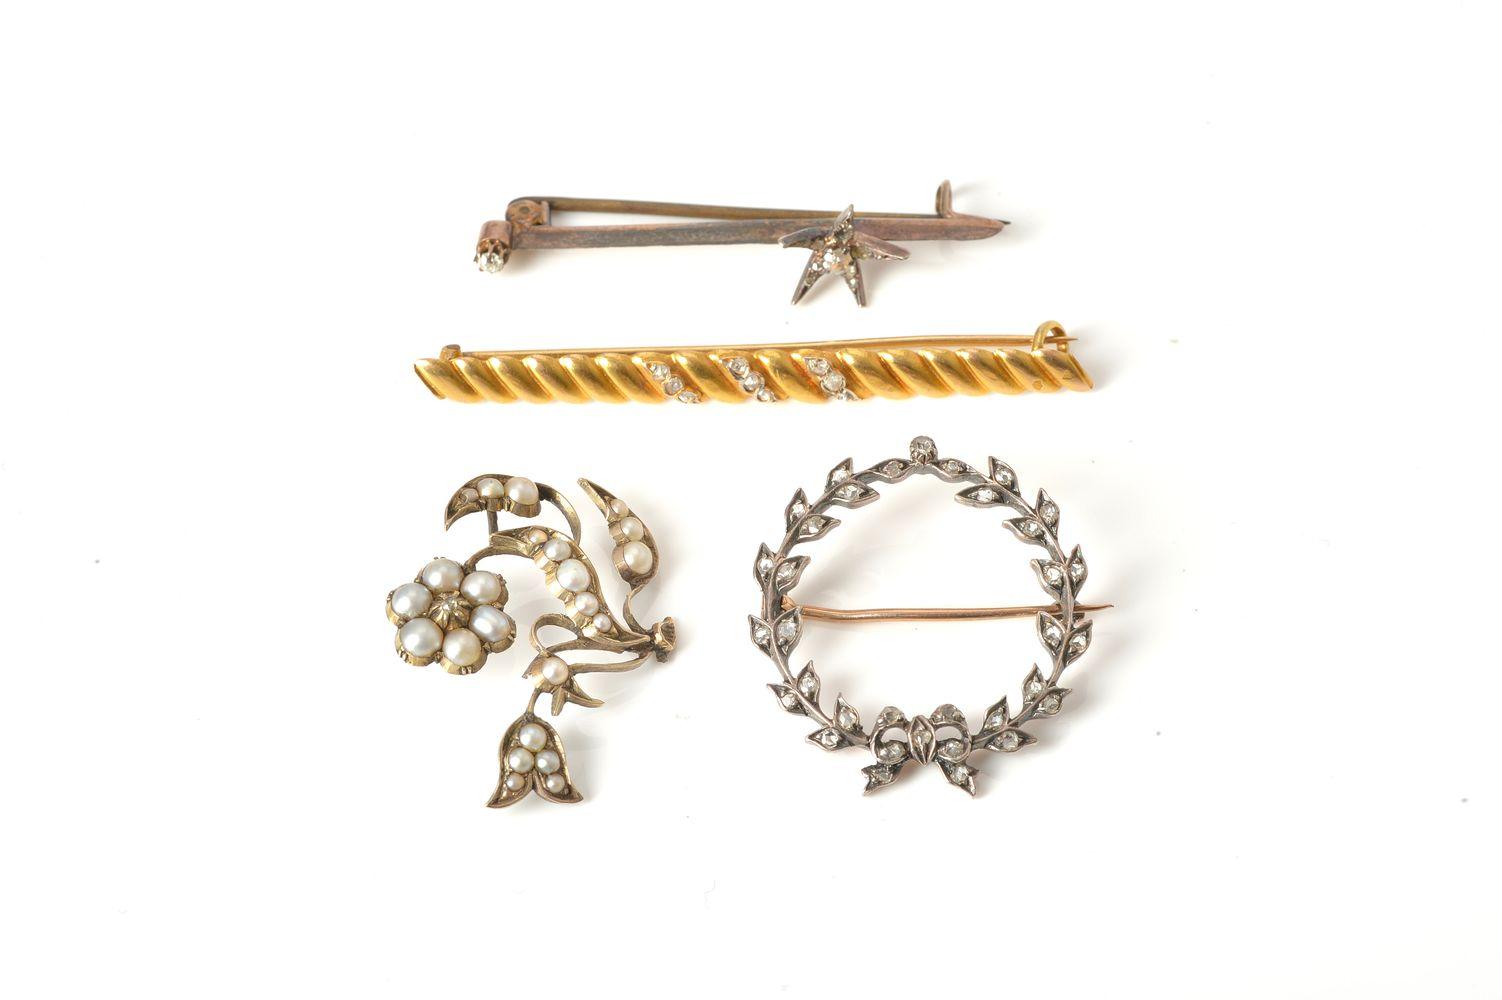 Lot 841 - A bar brooch of elongated ribbed design